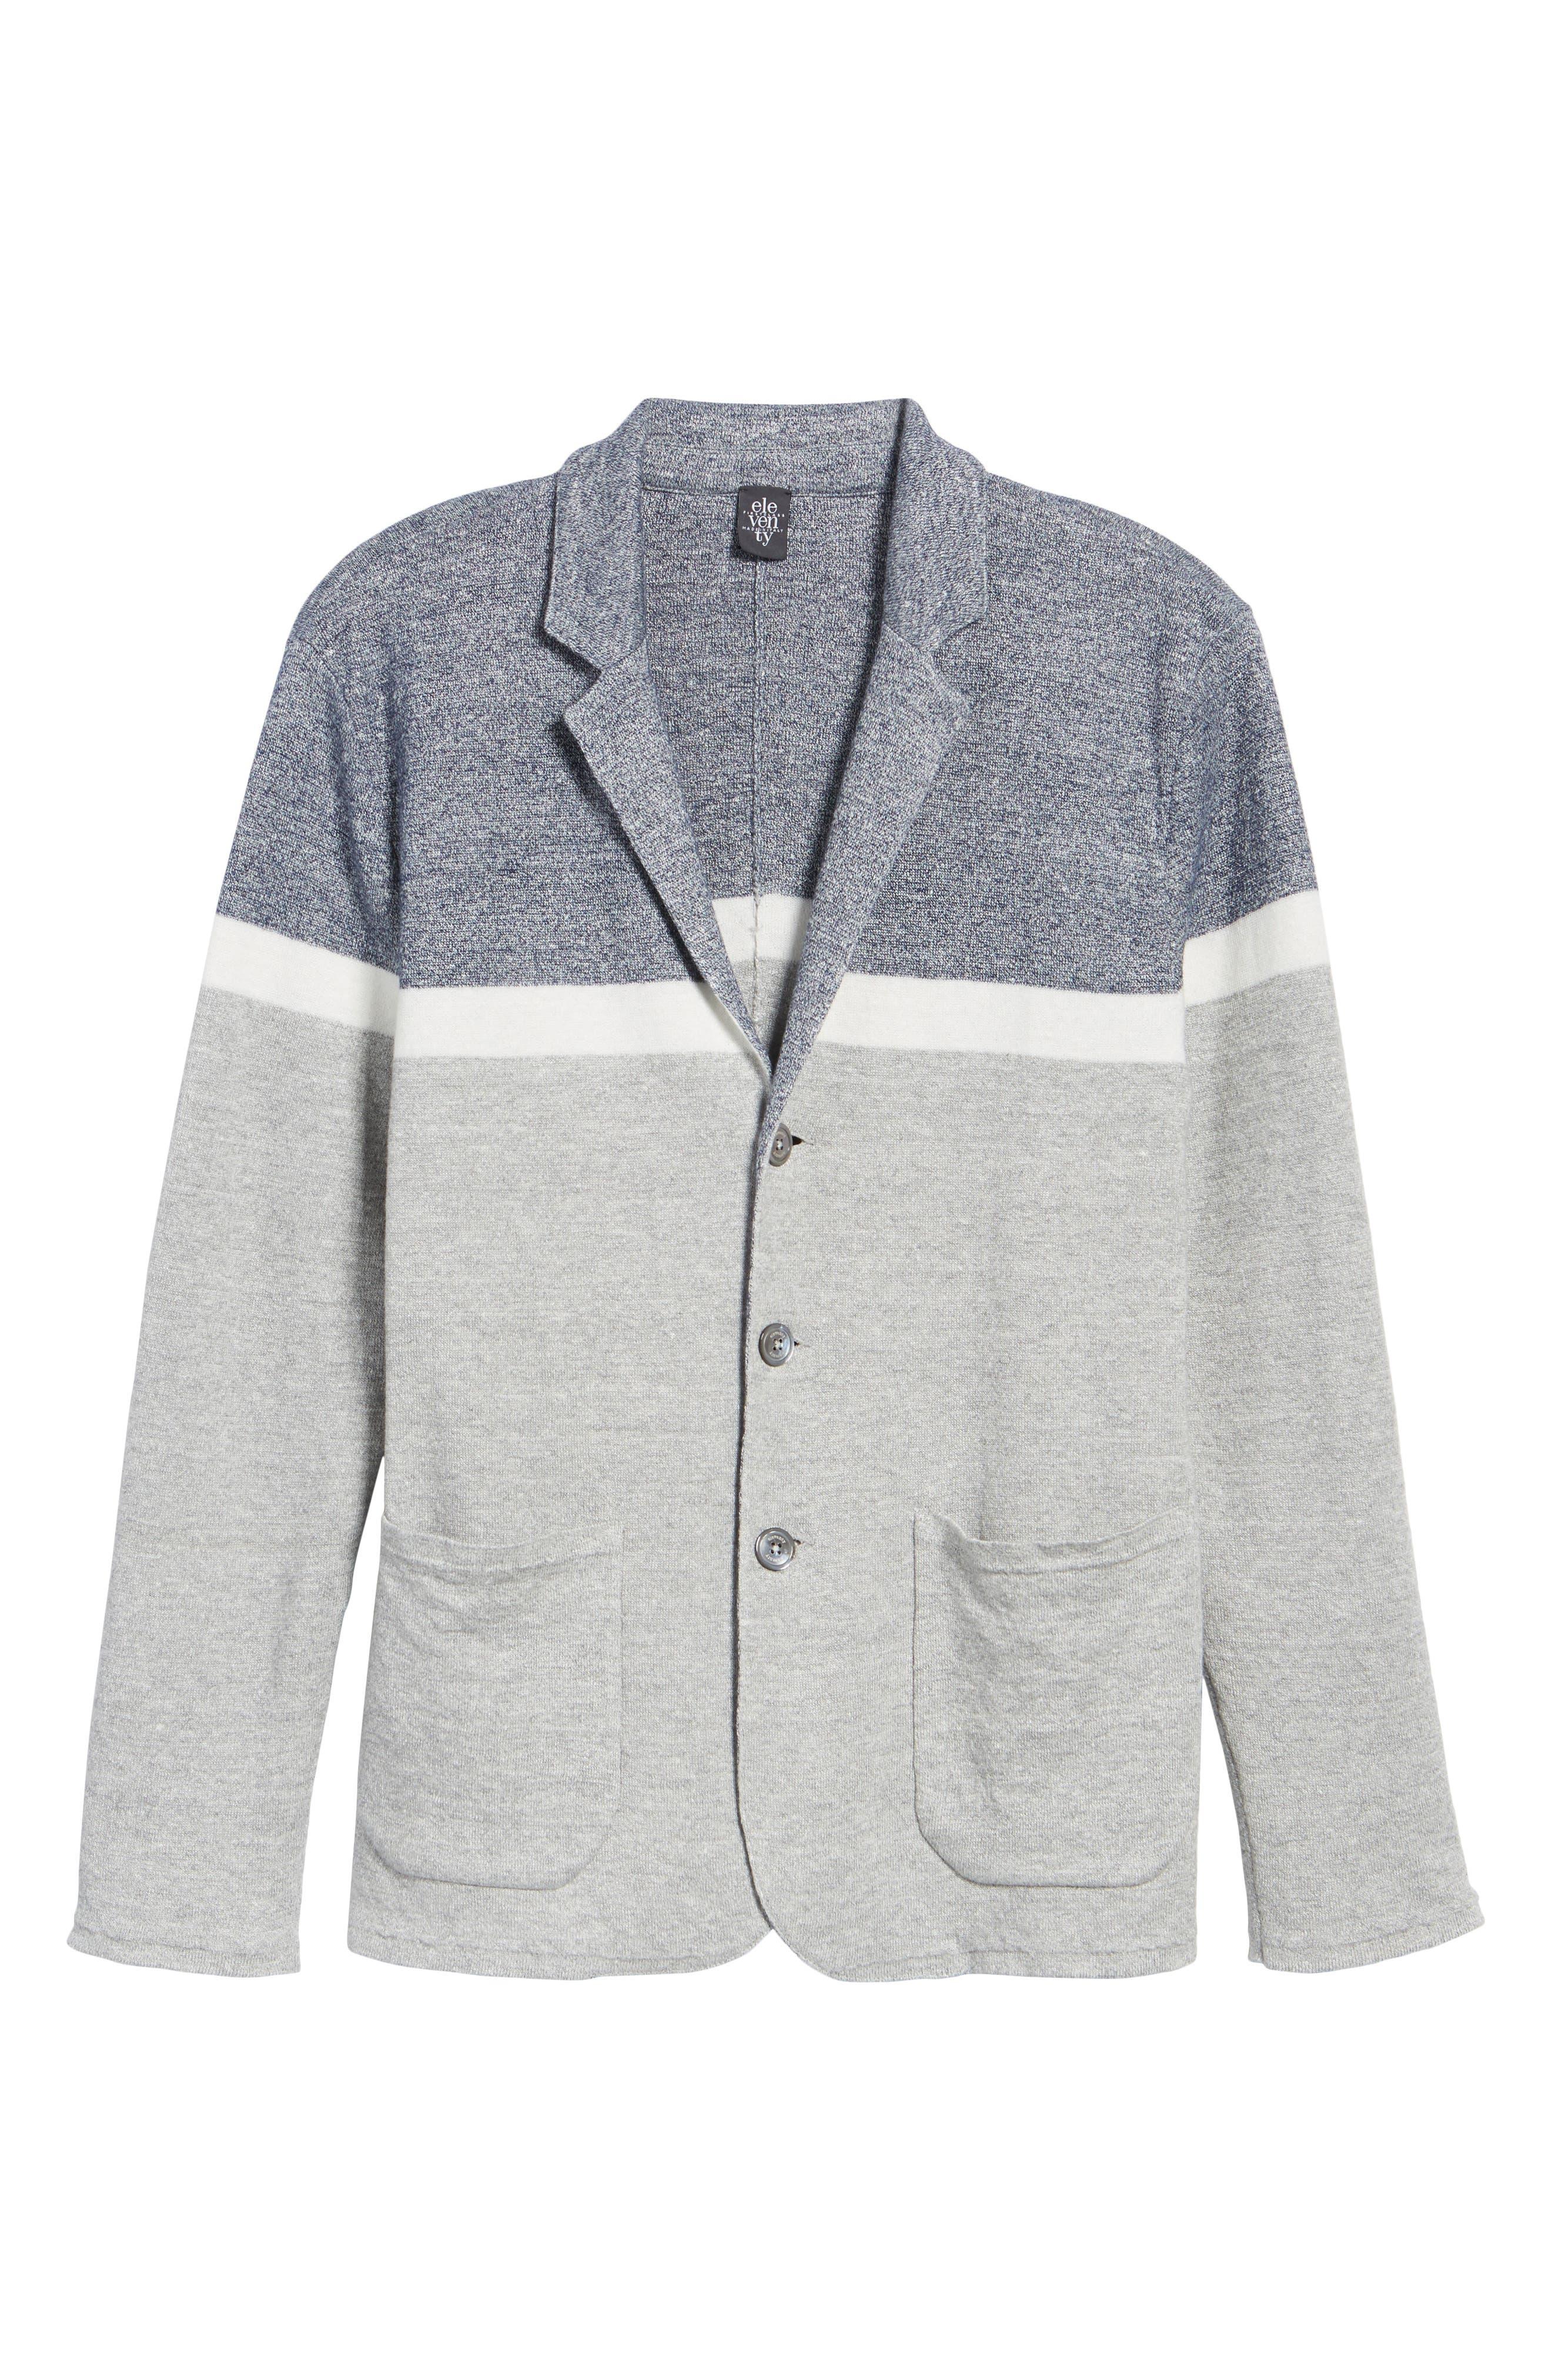 Colorblock Sweater Jacket,                             Alternate thumbnail 6, color,